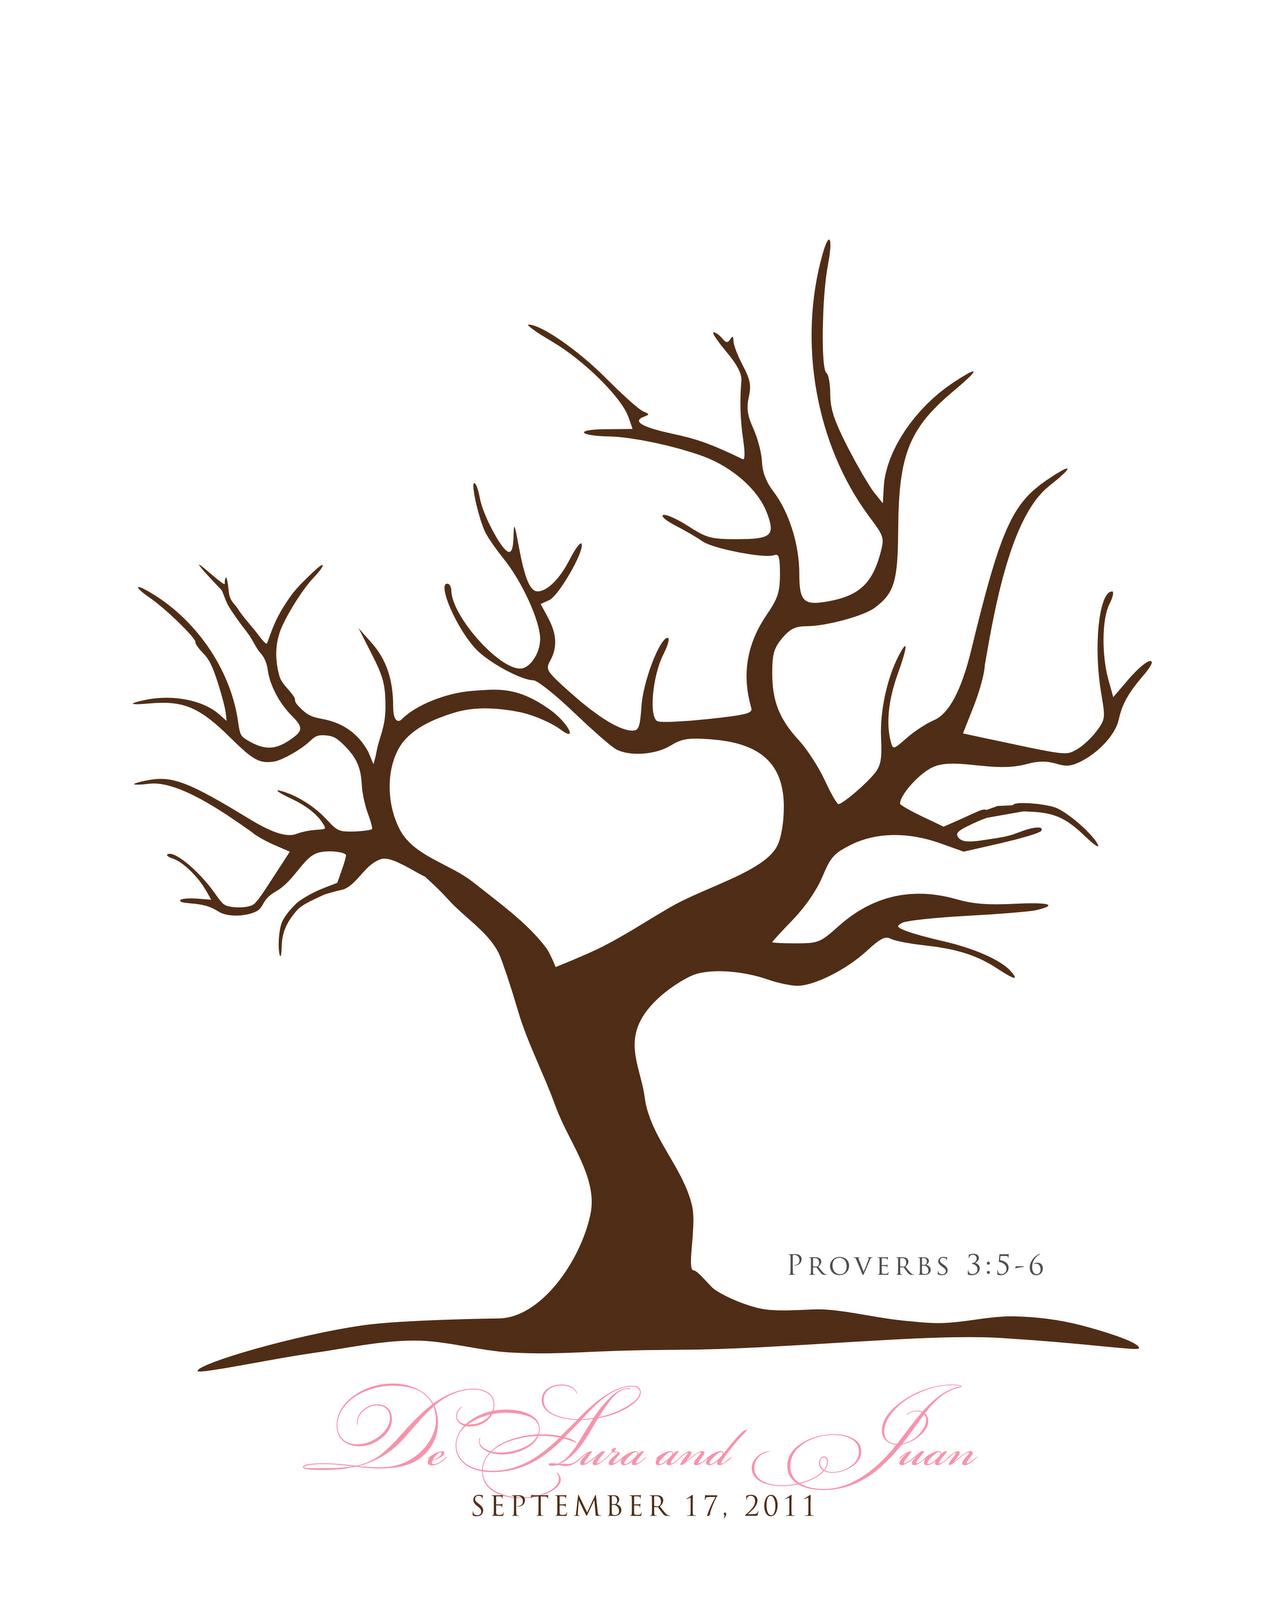 Free Printable Fingerprint Tree Template | Embroidery | Pinterest - Free Printable Tree Template